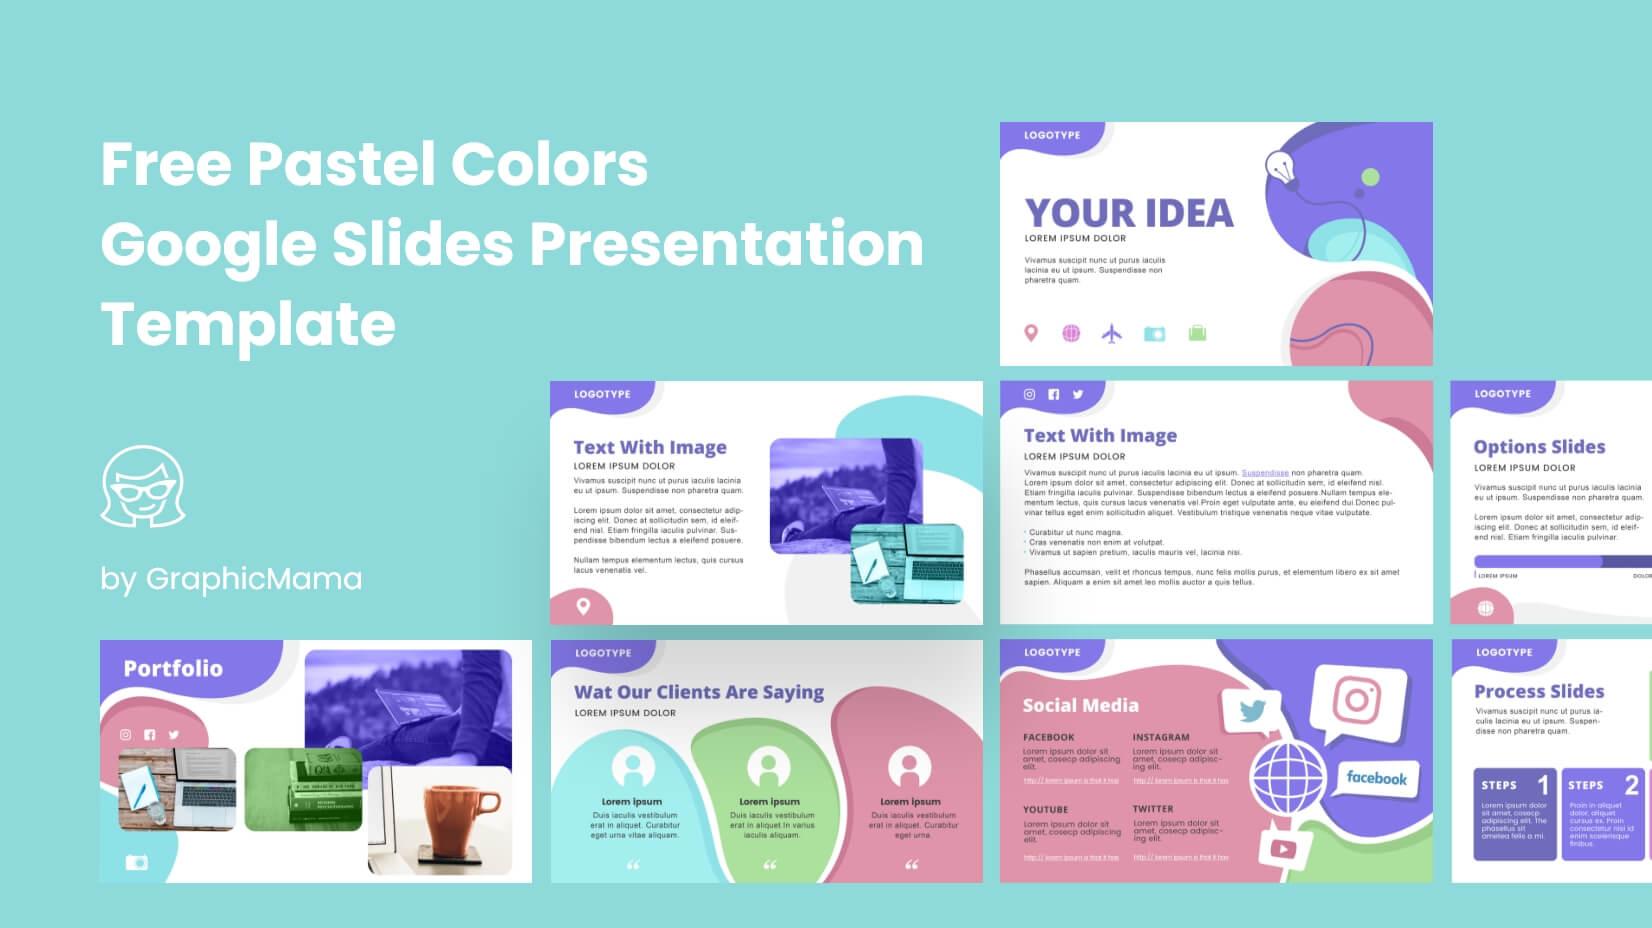 Free-Pastel-Colors-Google-Slides-Presentation-Template.